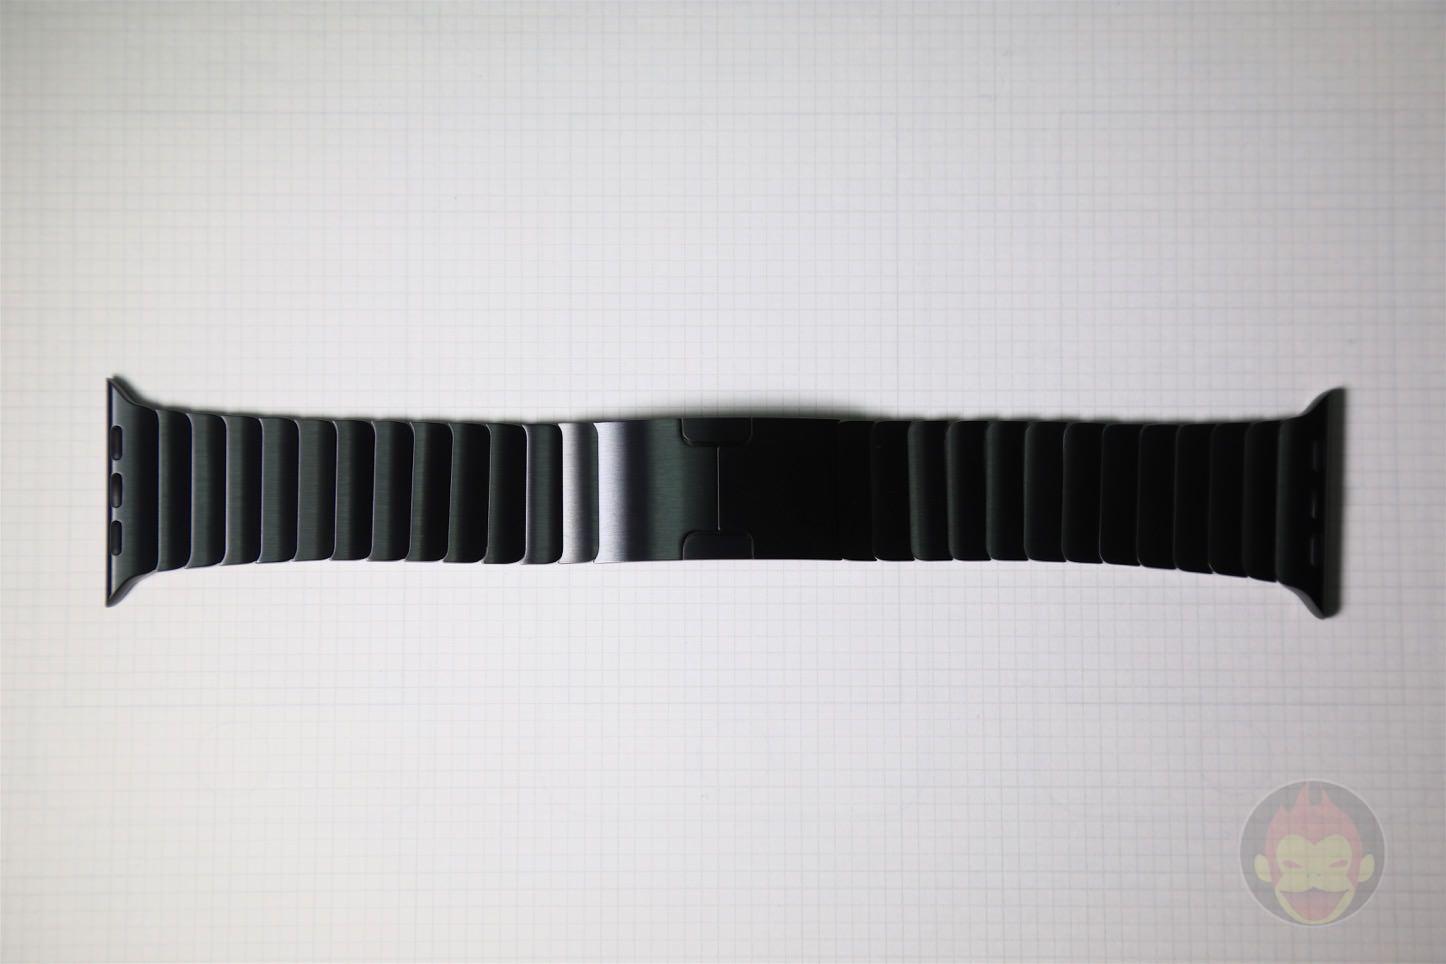 Apple-Link-Bracelet-Black-04.jpg